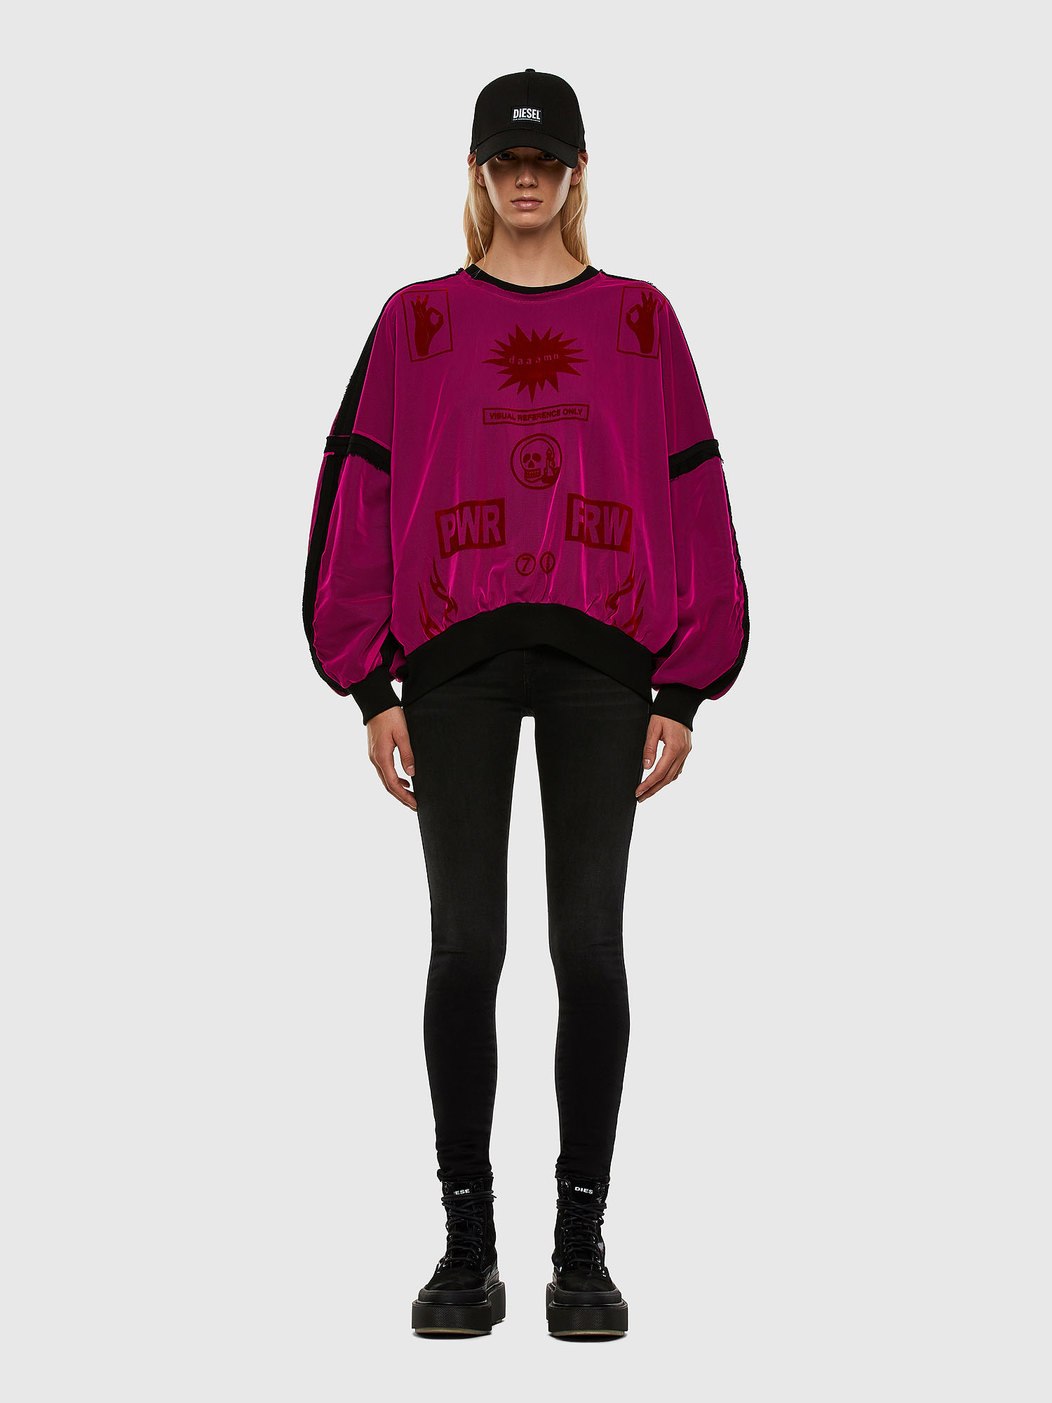 Cotton Jersey Sweatshirt